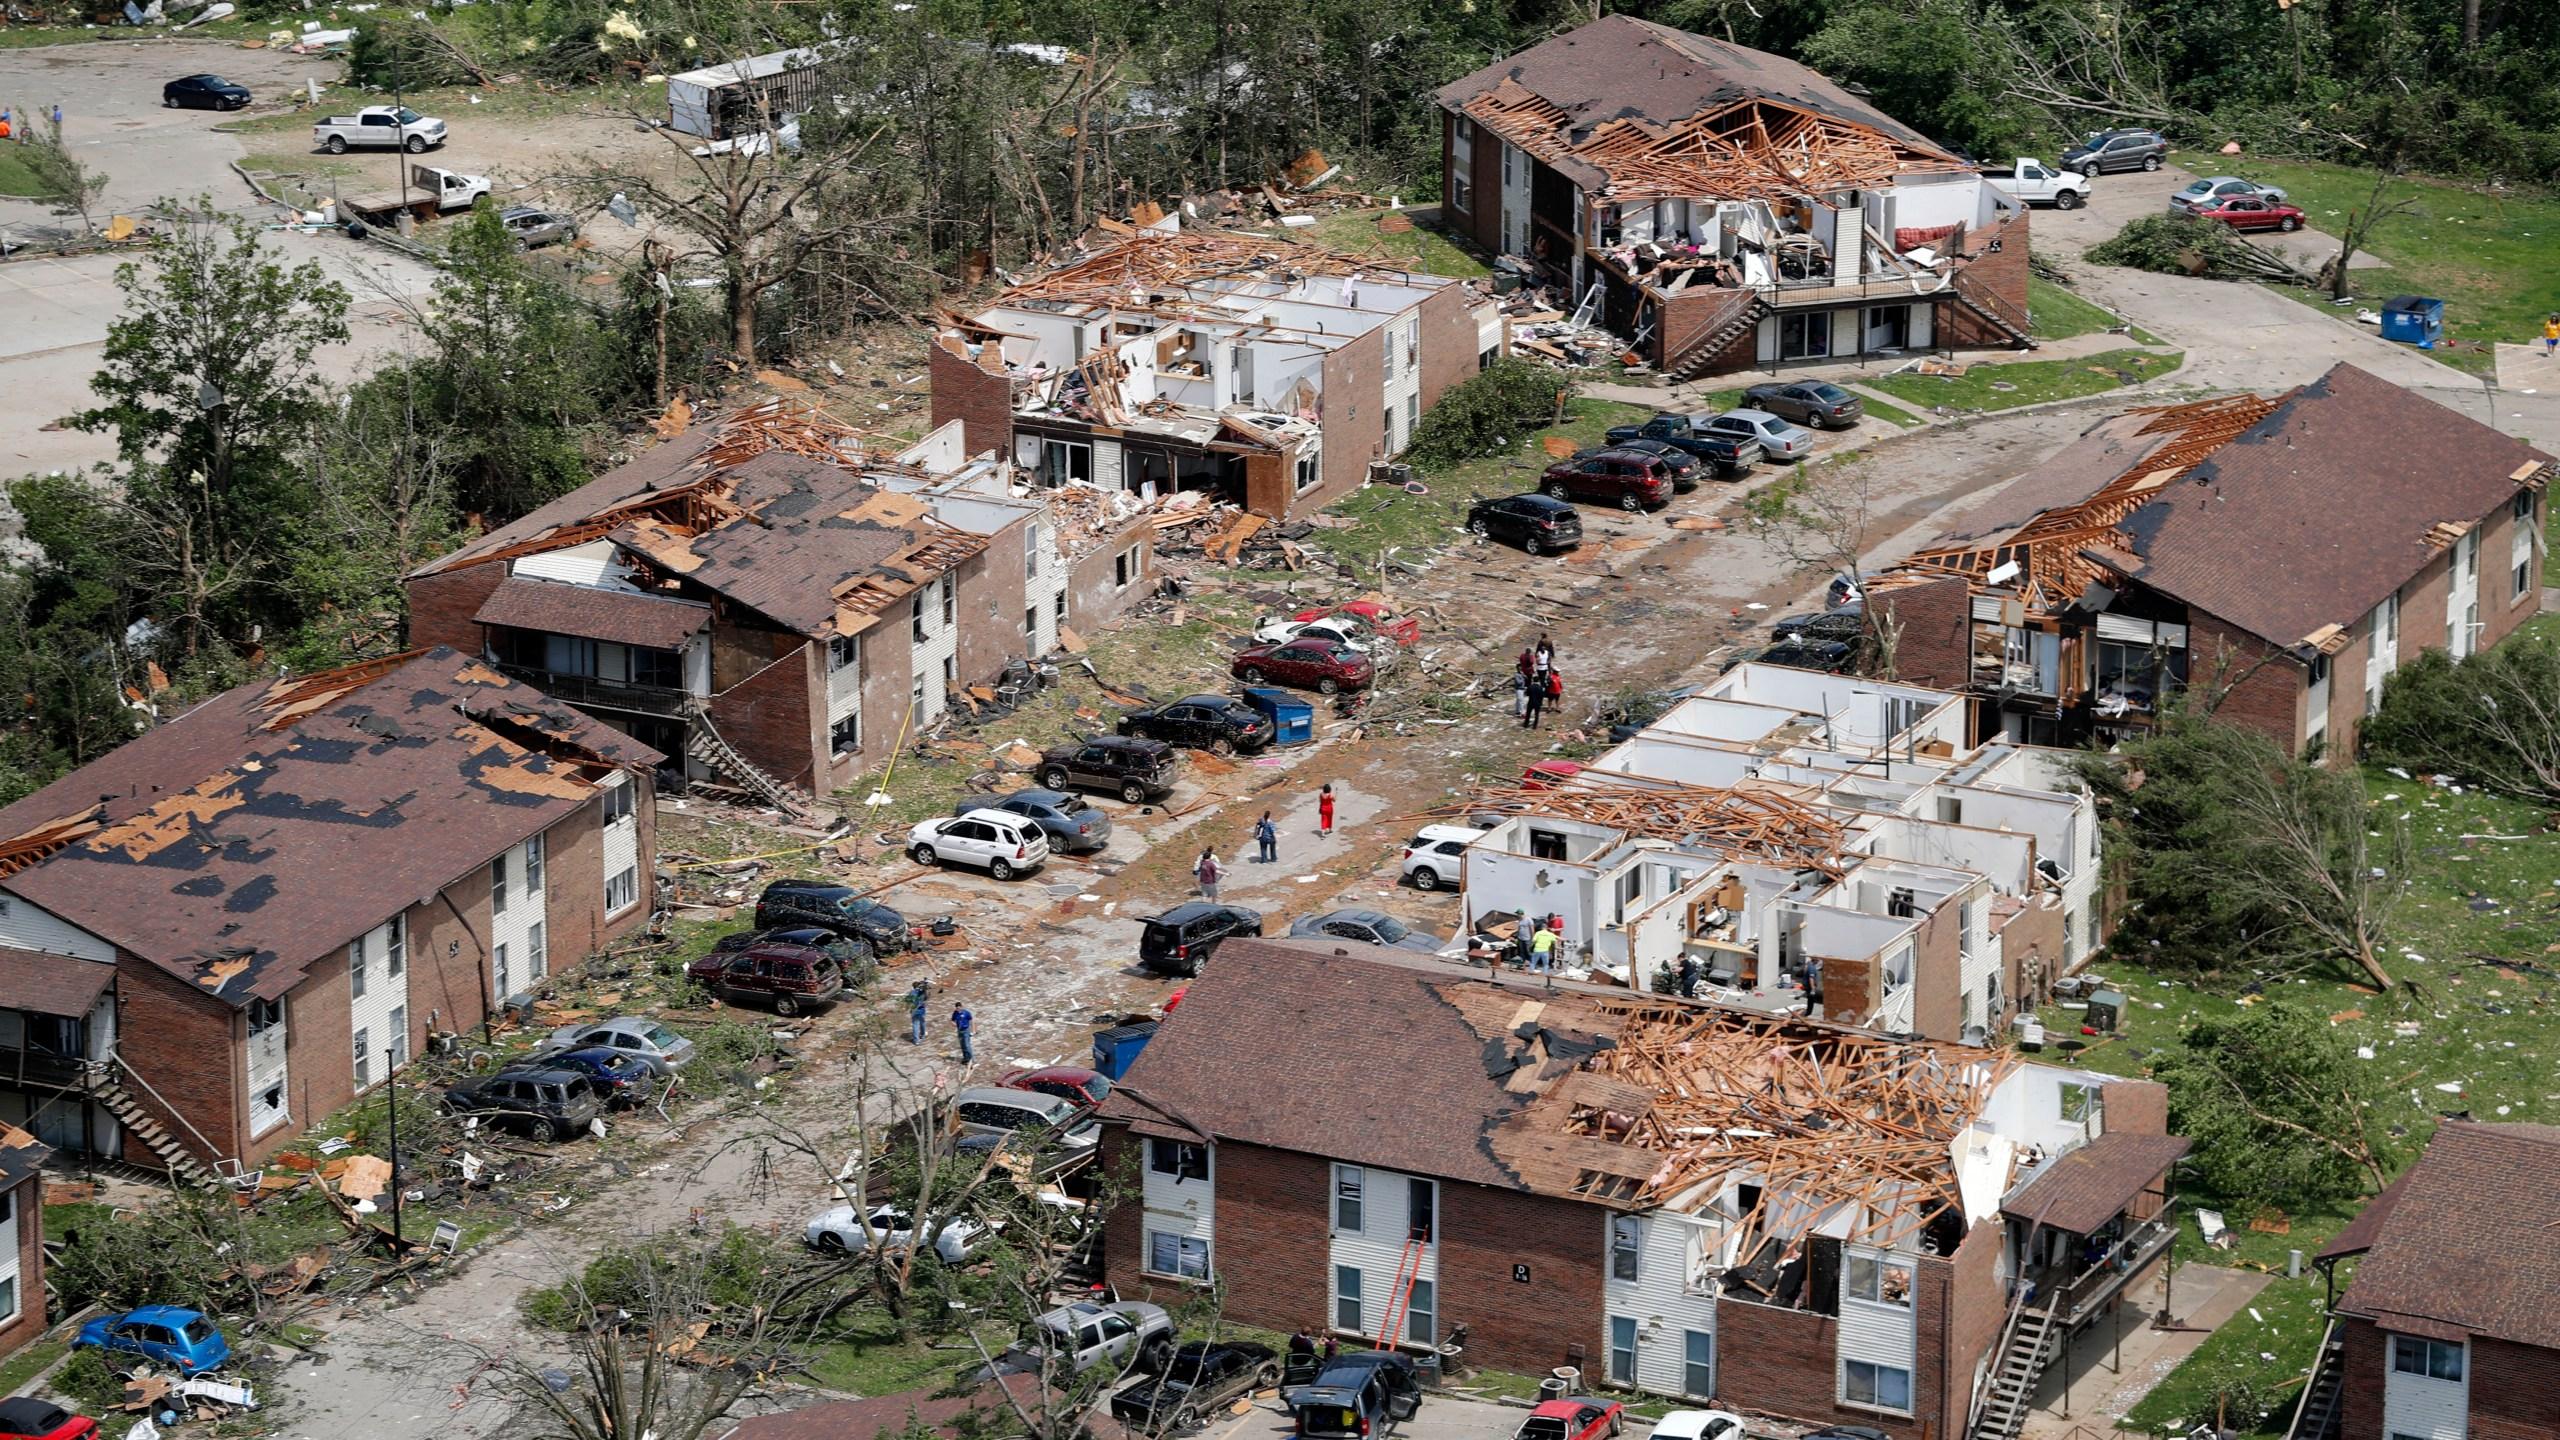 Severe_Weather-Missouri_Tornadoes_46057-159532.jpg71406284